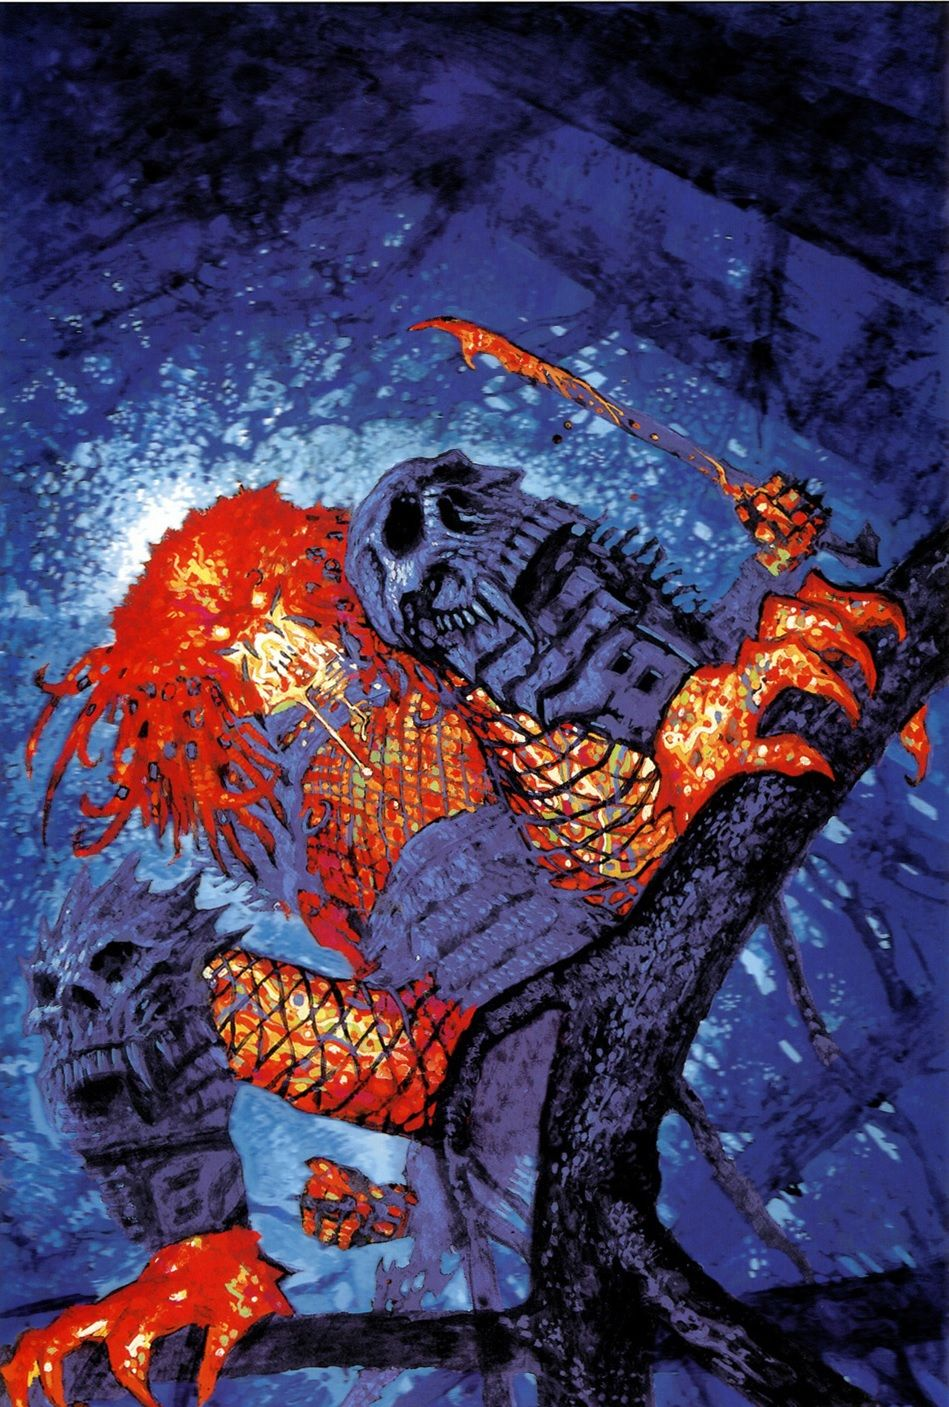 The Bad Blood Predator is ready to strike #Predator